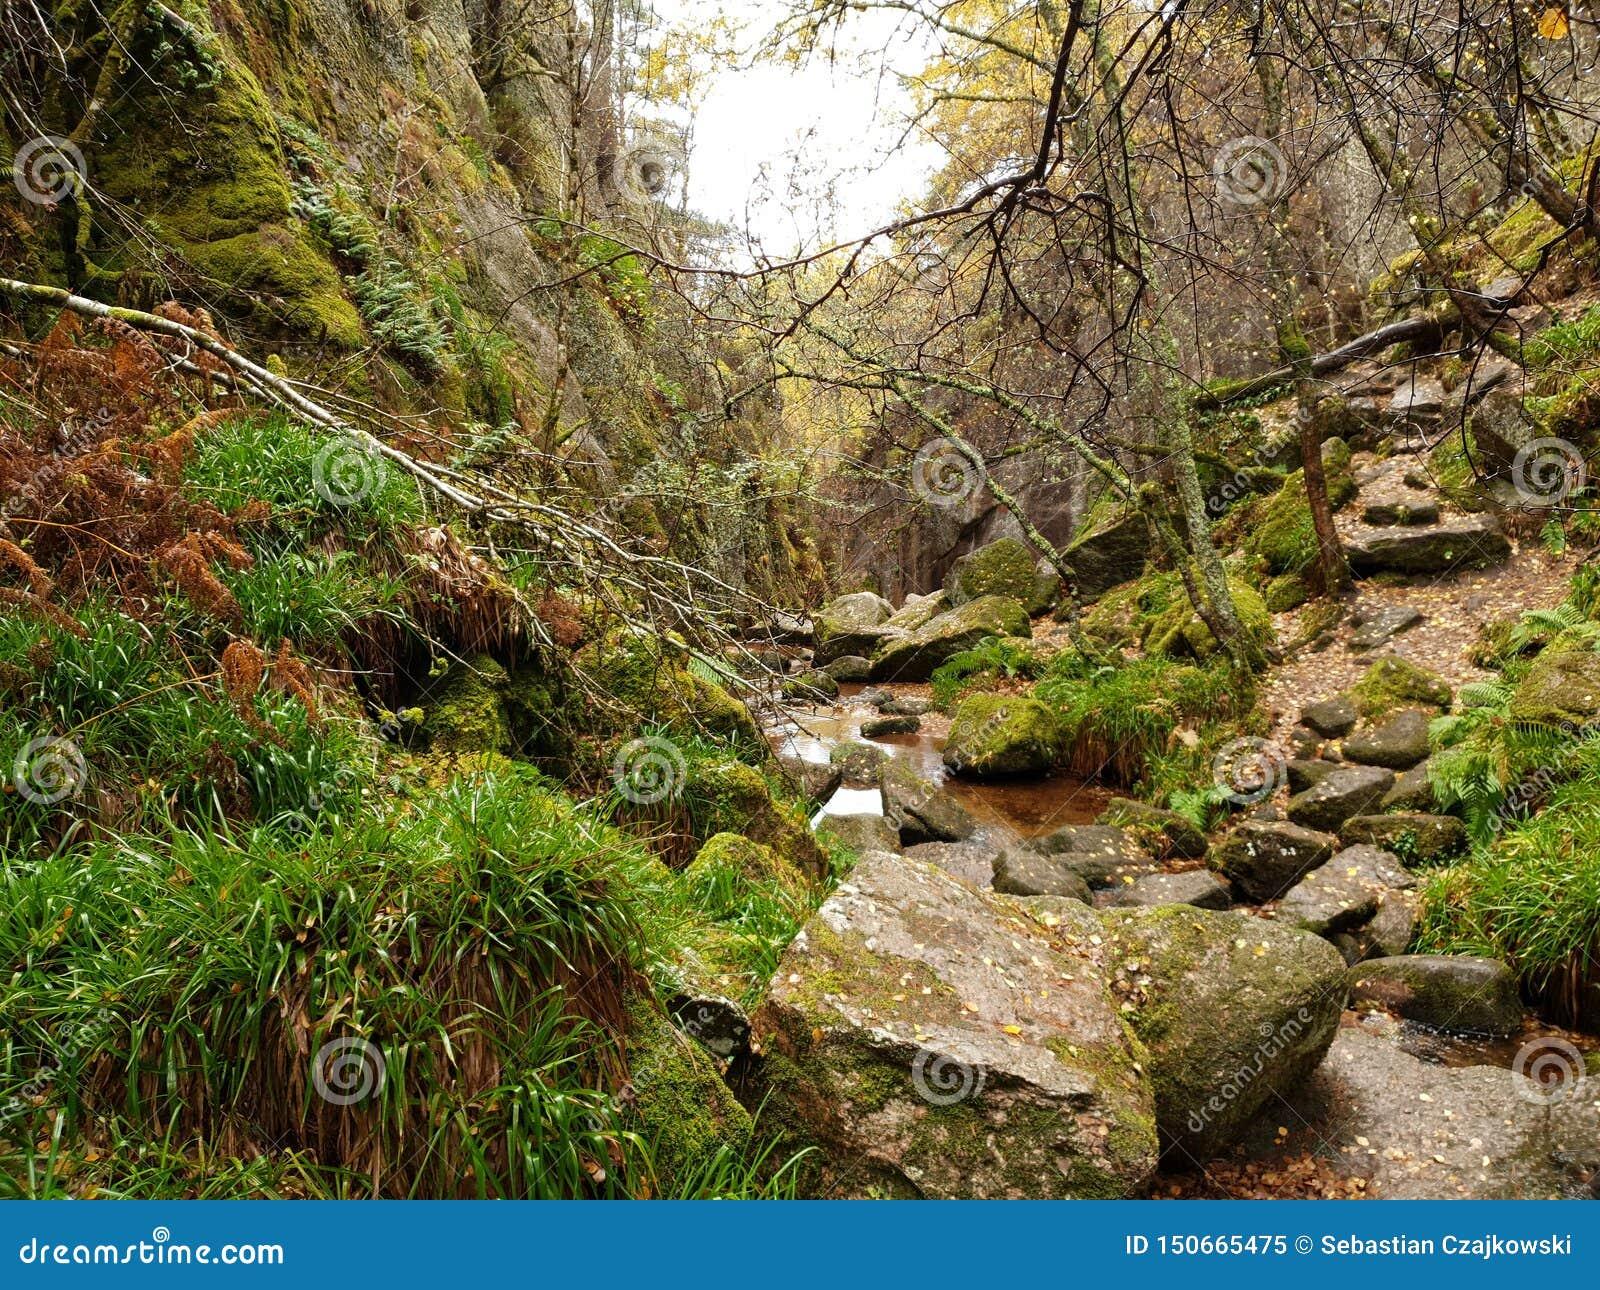 Natureza do fundo da floresta